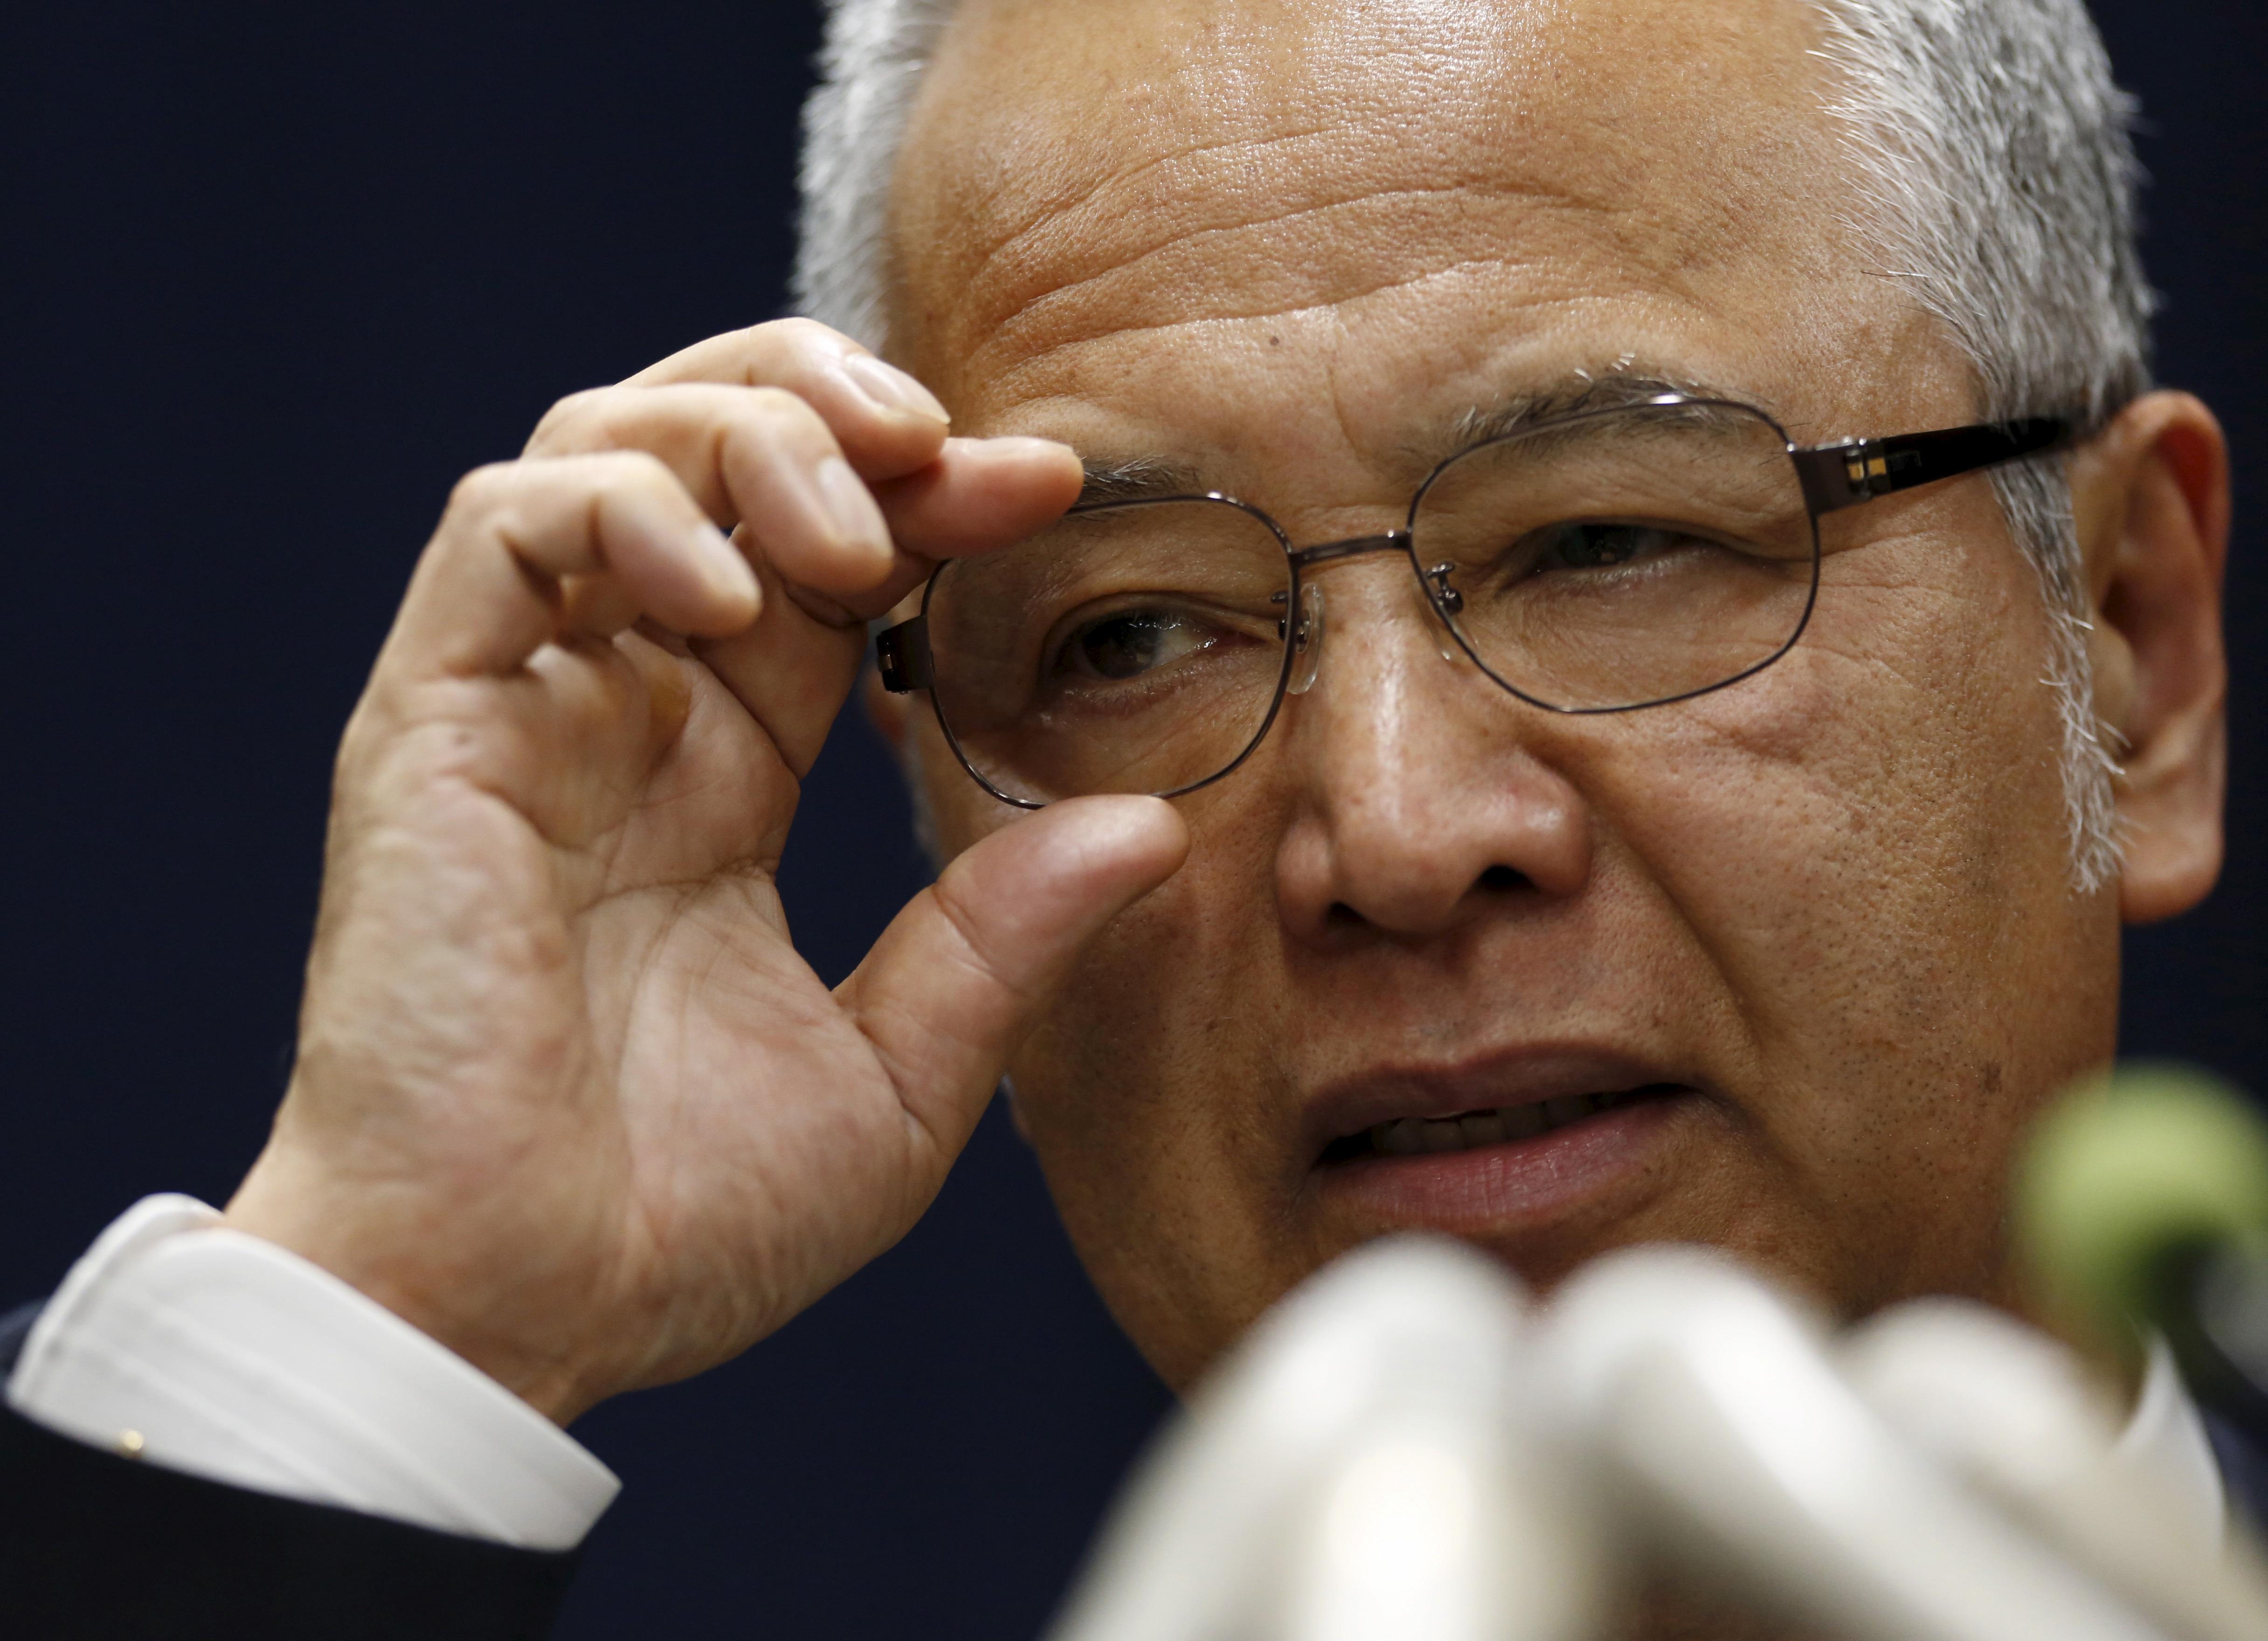 Japan's Economics Minister Akira Amari speaks during a news conference in Tokyo, Japan, January 28, 2016. REUTERS/Yuya Shino